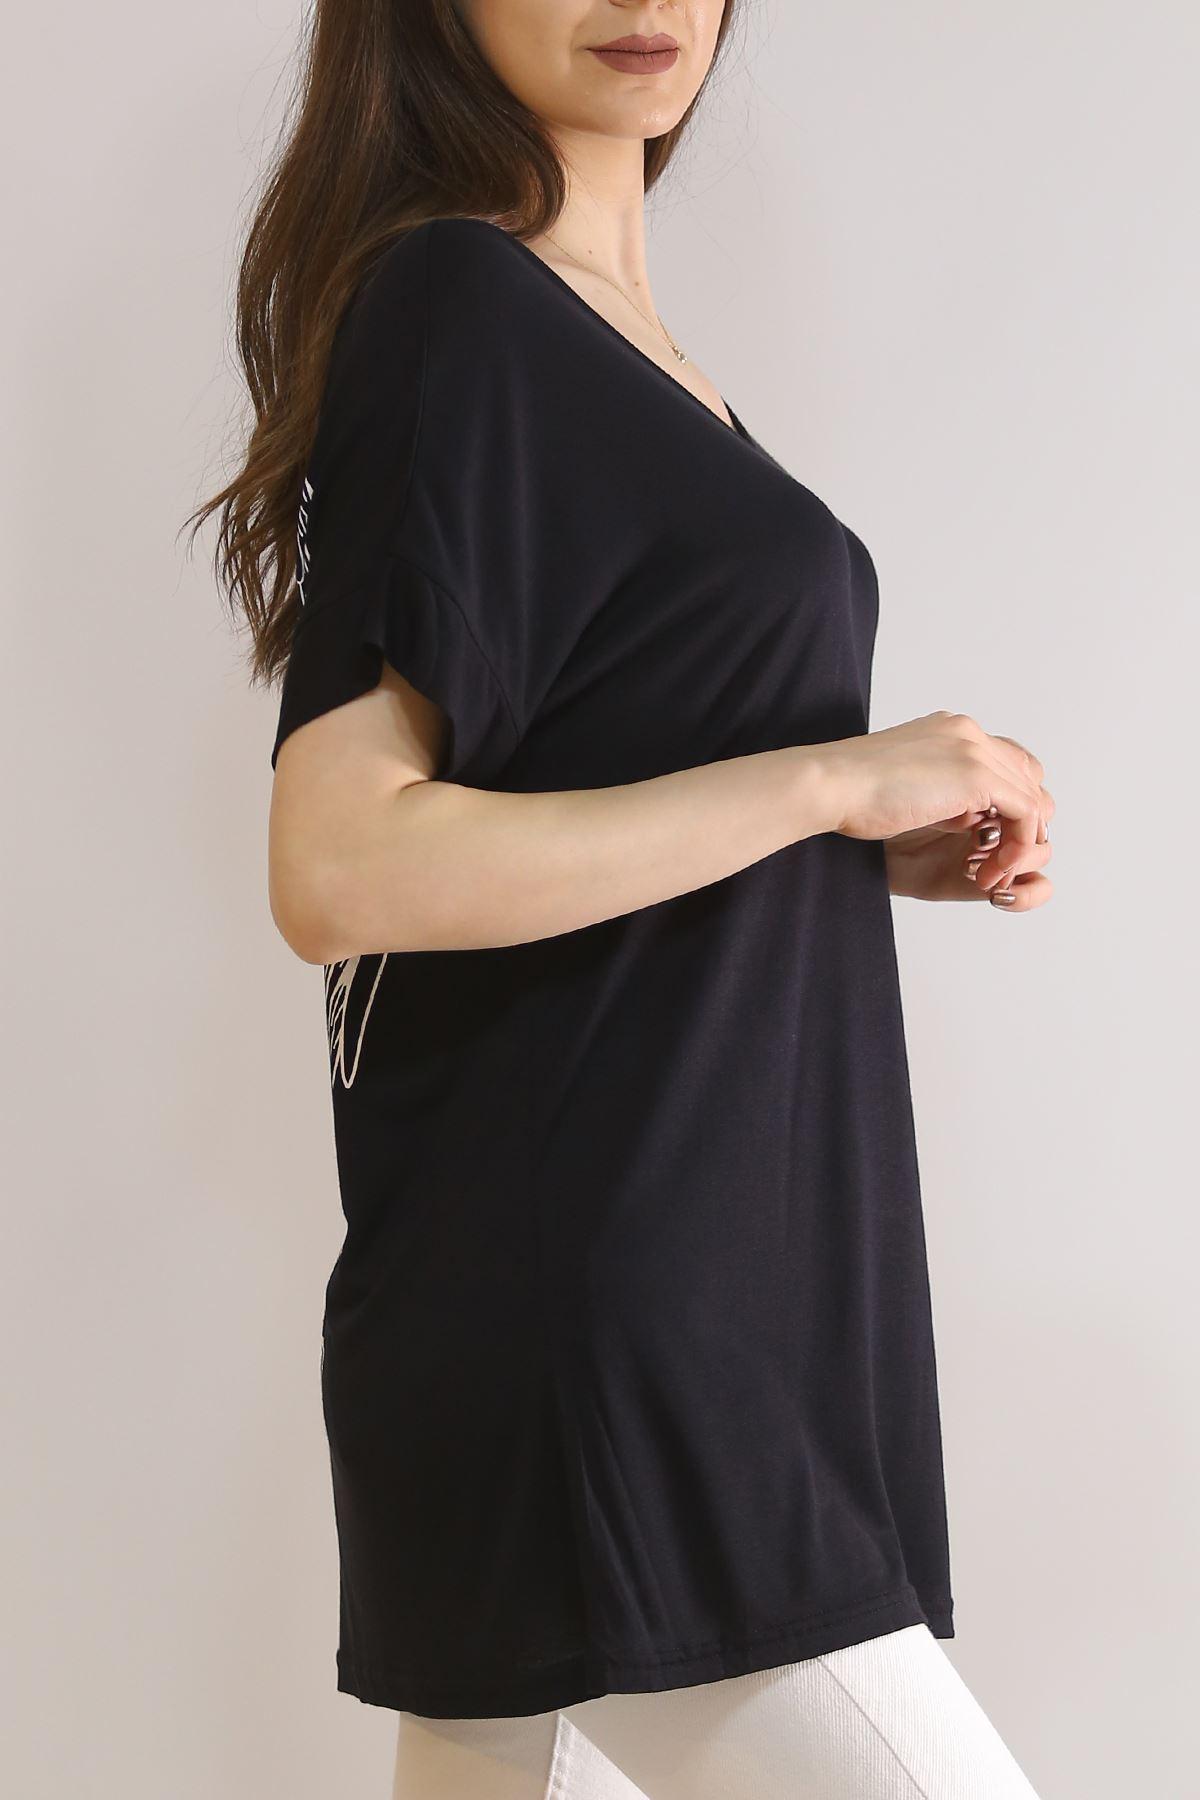 Kanat Baskılı Tişört Siyah - 5825.1092.